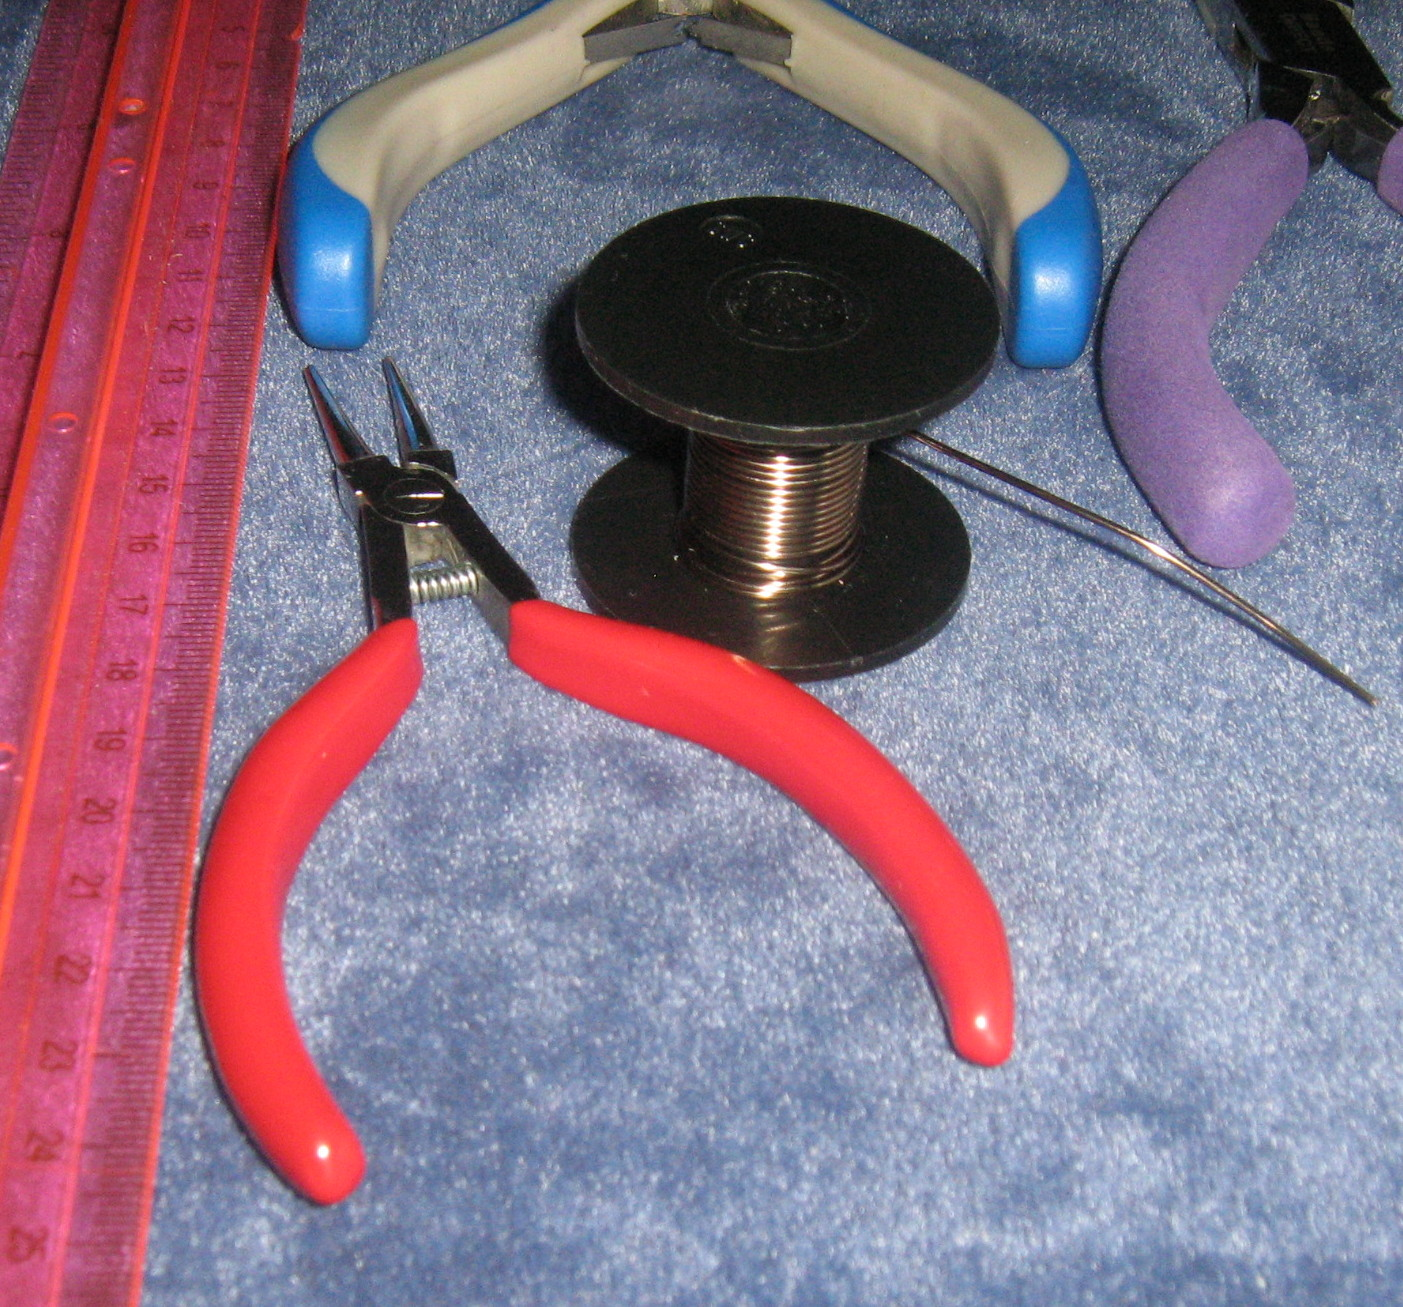 Handmade wire necklace